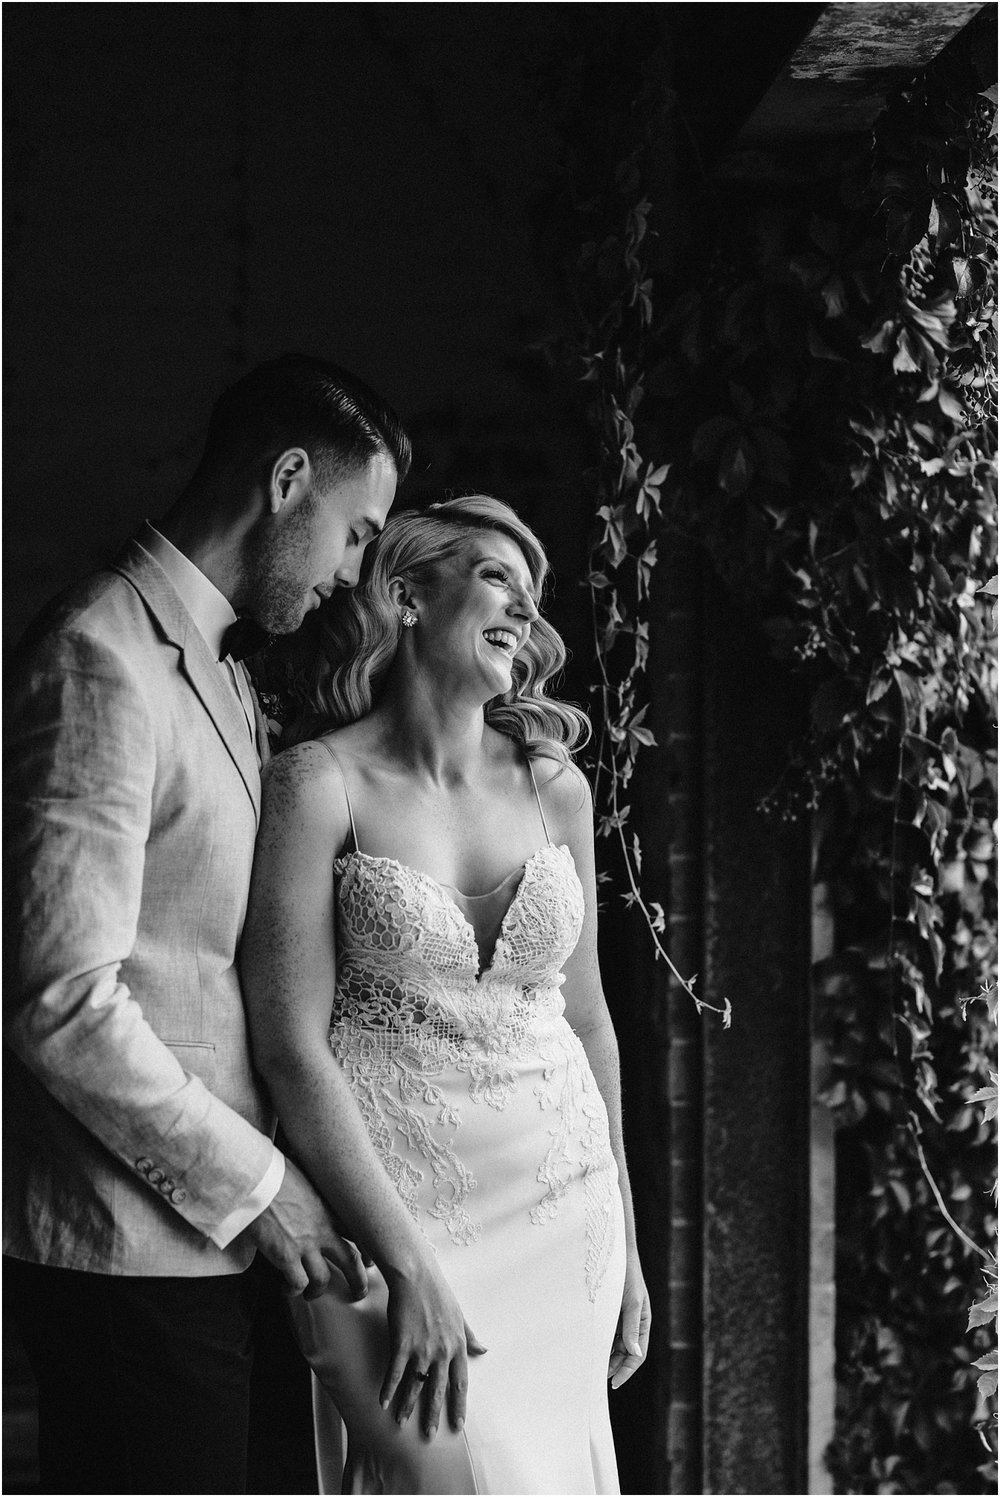 Katherine and Sam's stylish elopment at the Euroa Butter Factory._0065.jpg